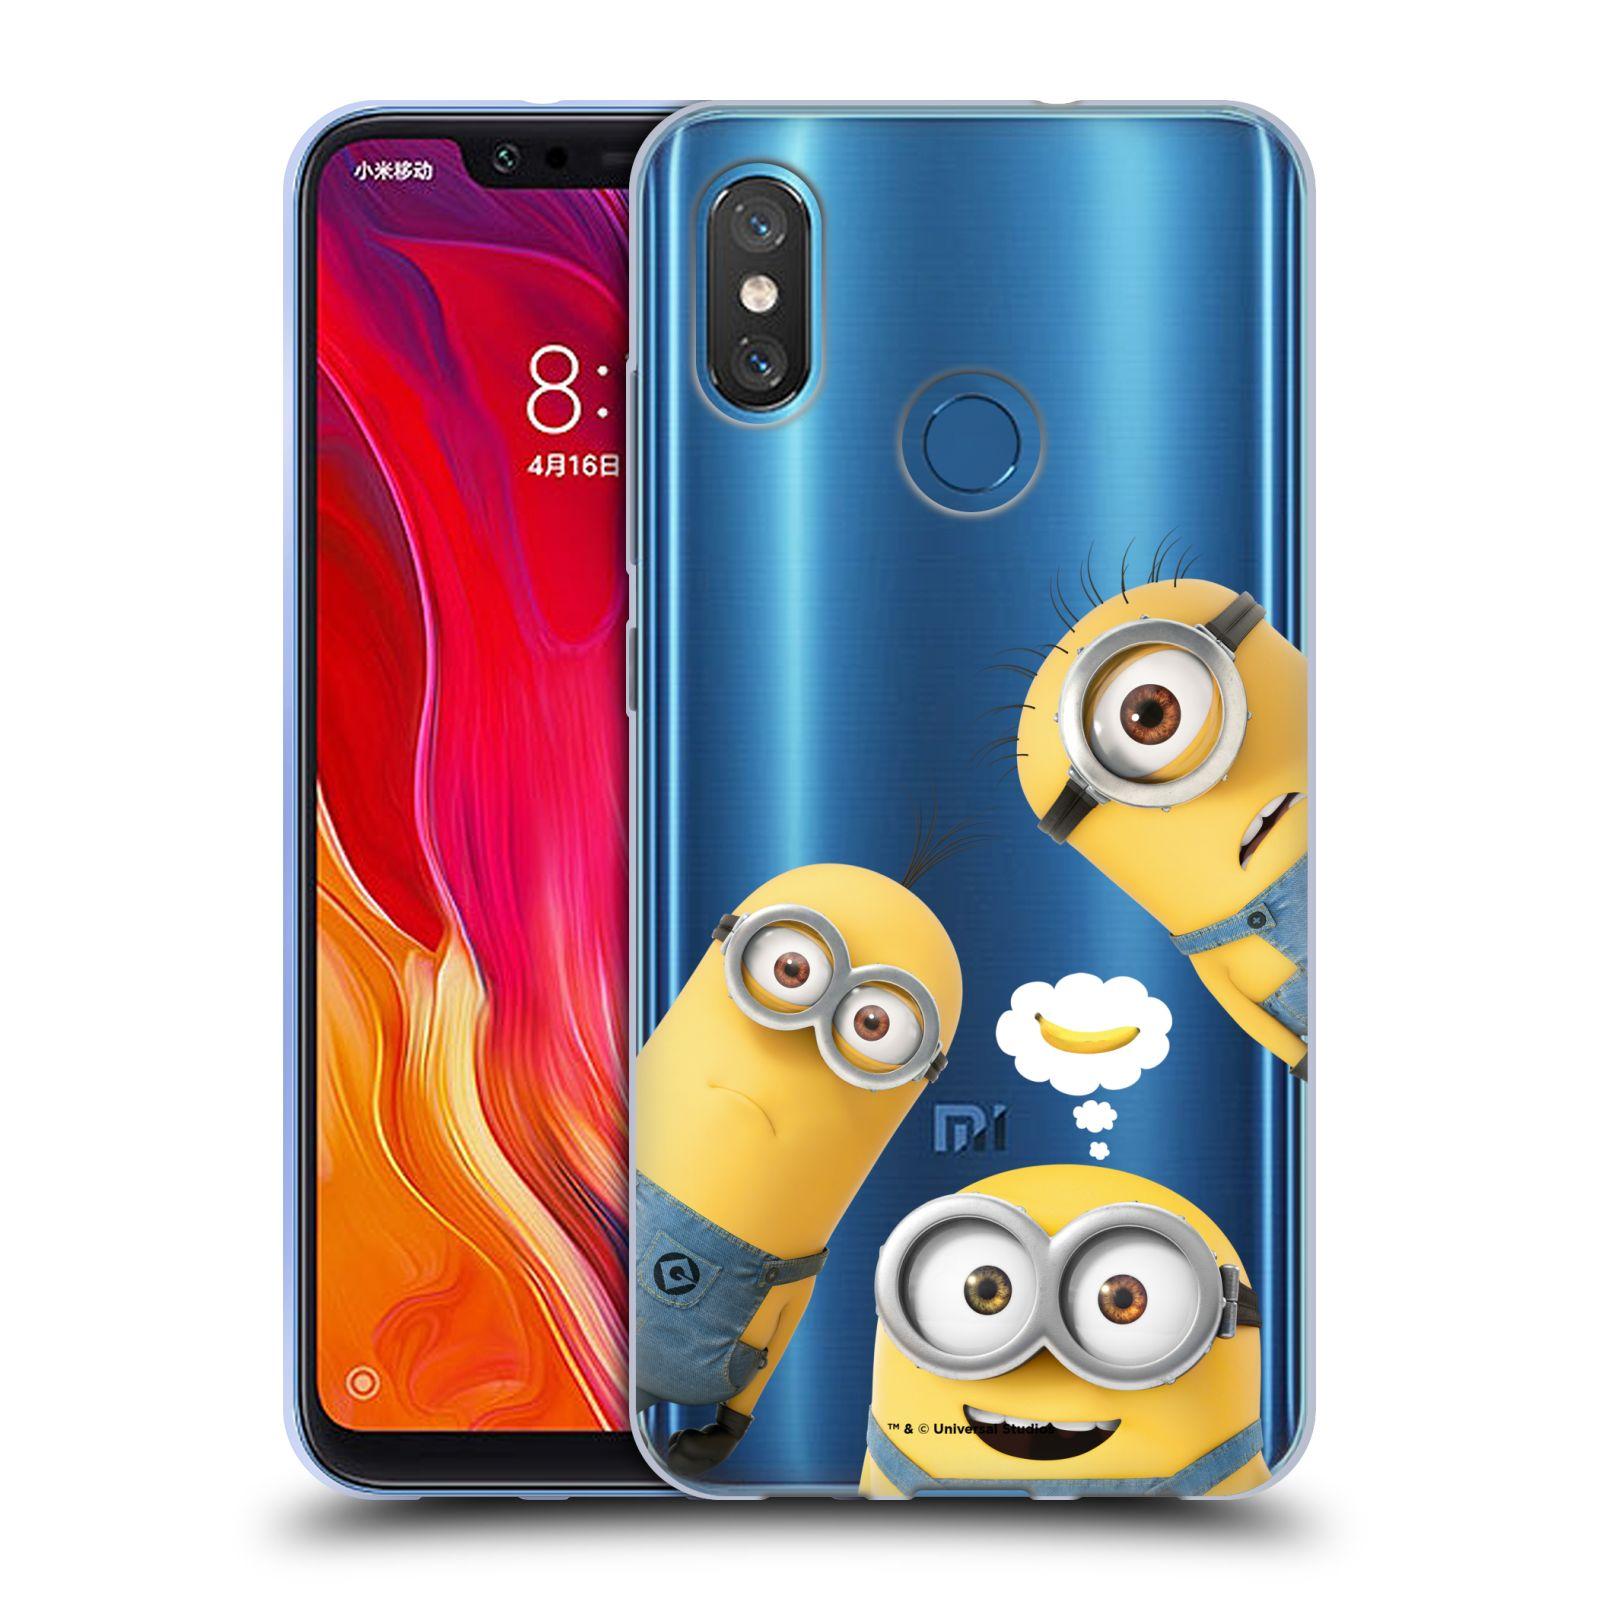 Silikonové pouzdro na mobil Xiaomi Mi8 - Head Case - Mimoni Banana z filmu Já, padouch - Despicable Me